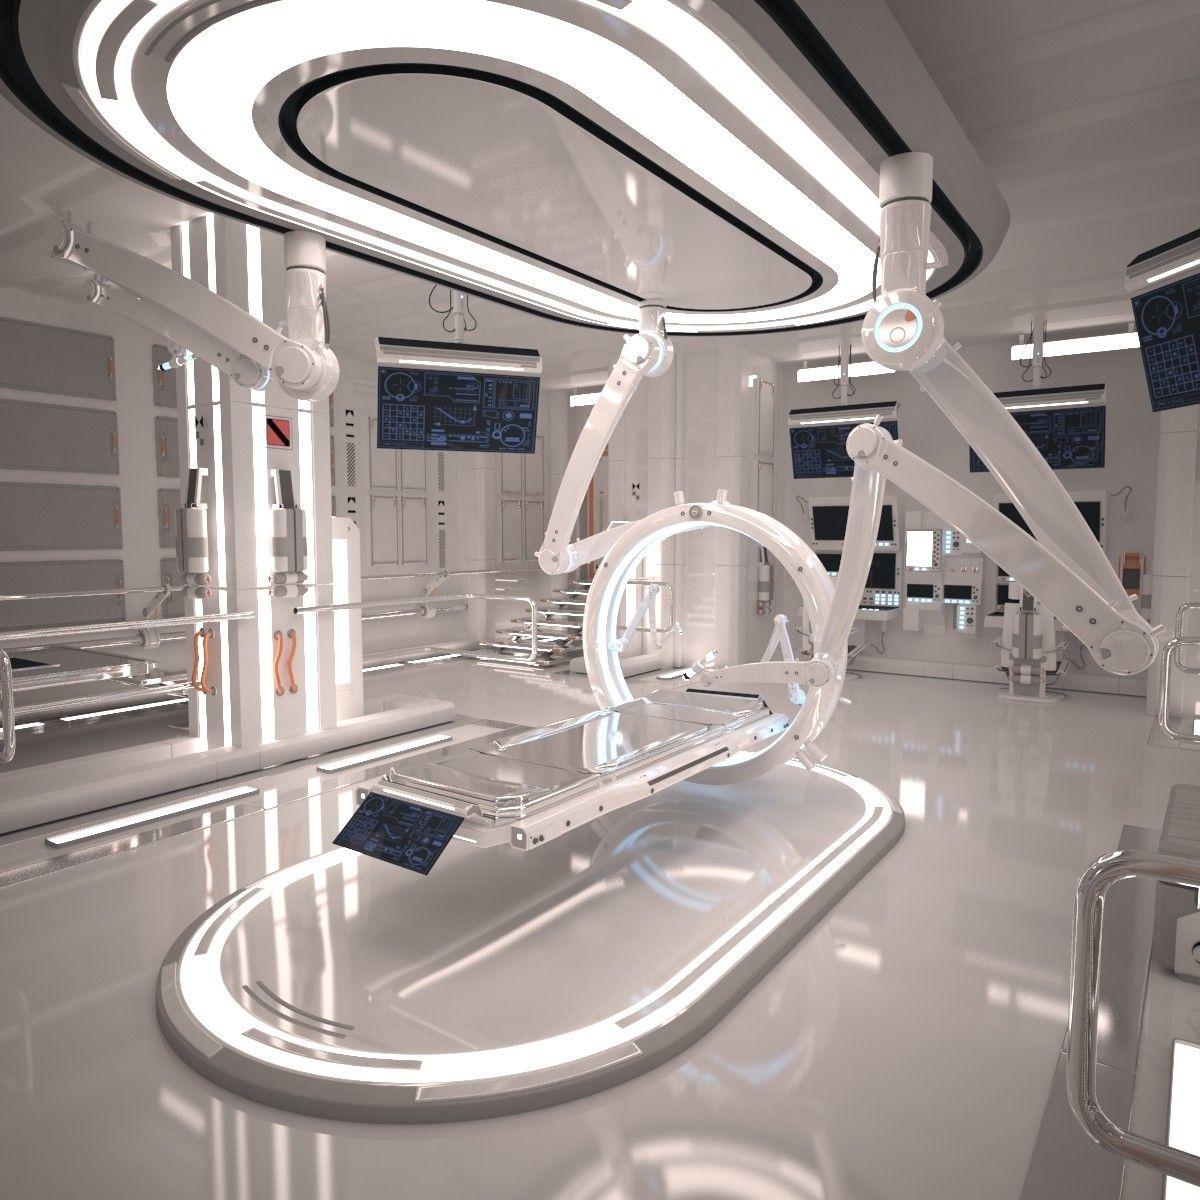 3D MODEL: https://www.turbosquid.com/3d-models/3d-futuristic-sci-fi-laboratory/1005910?referral=cermaka